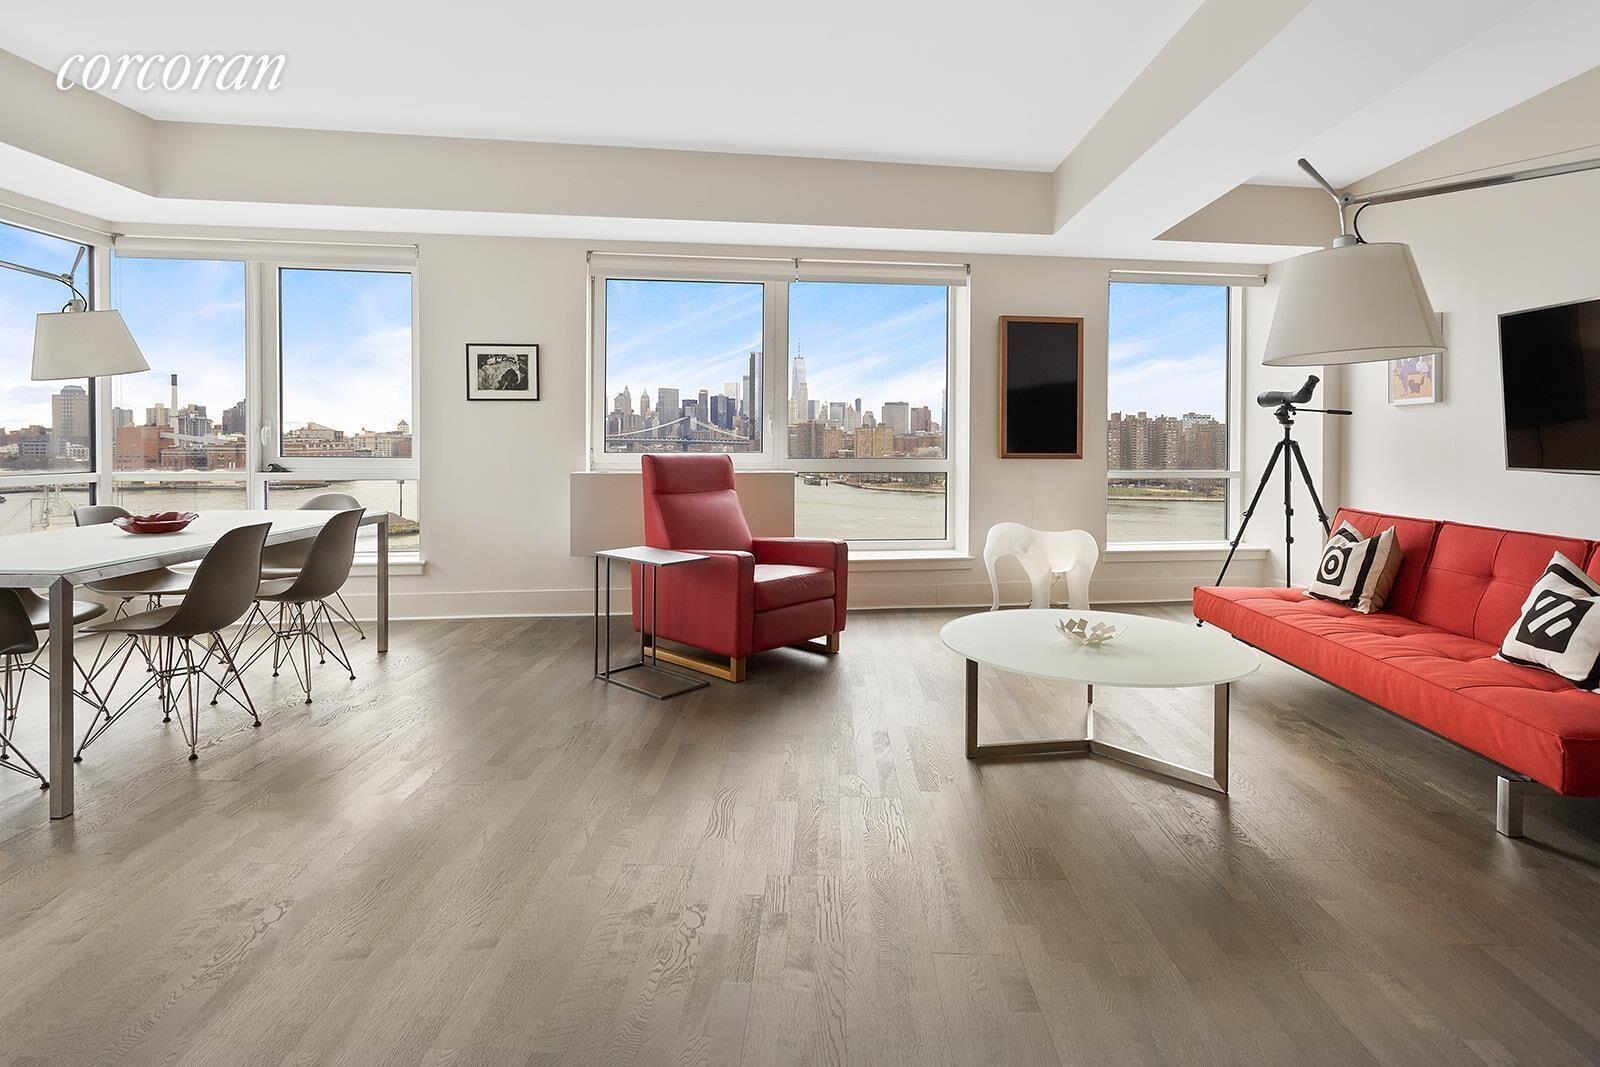 Apartment for sale at 440 Kent Avenue, Apt 15A